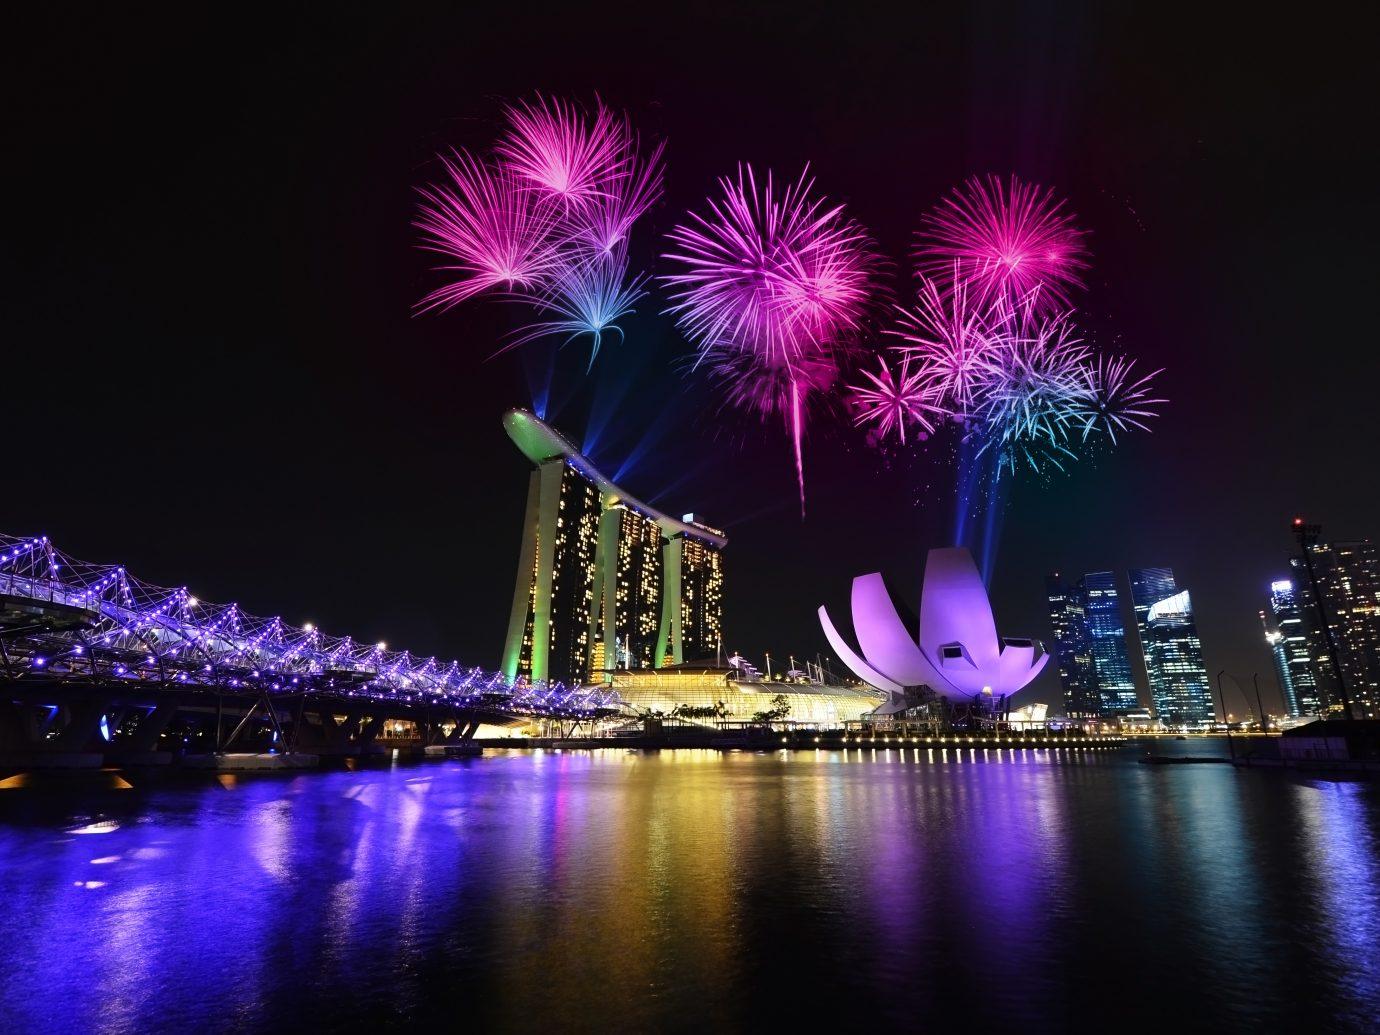 Fireworks over singapore Skyline